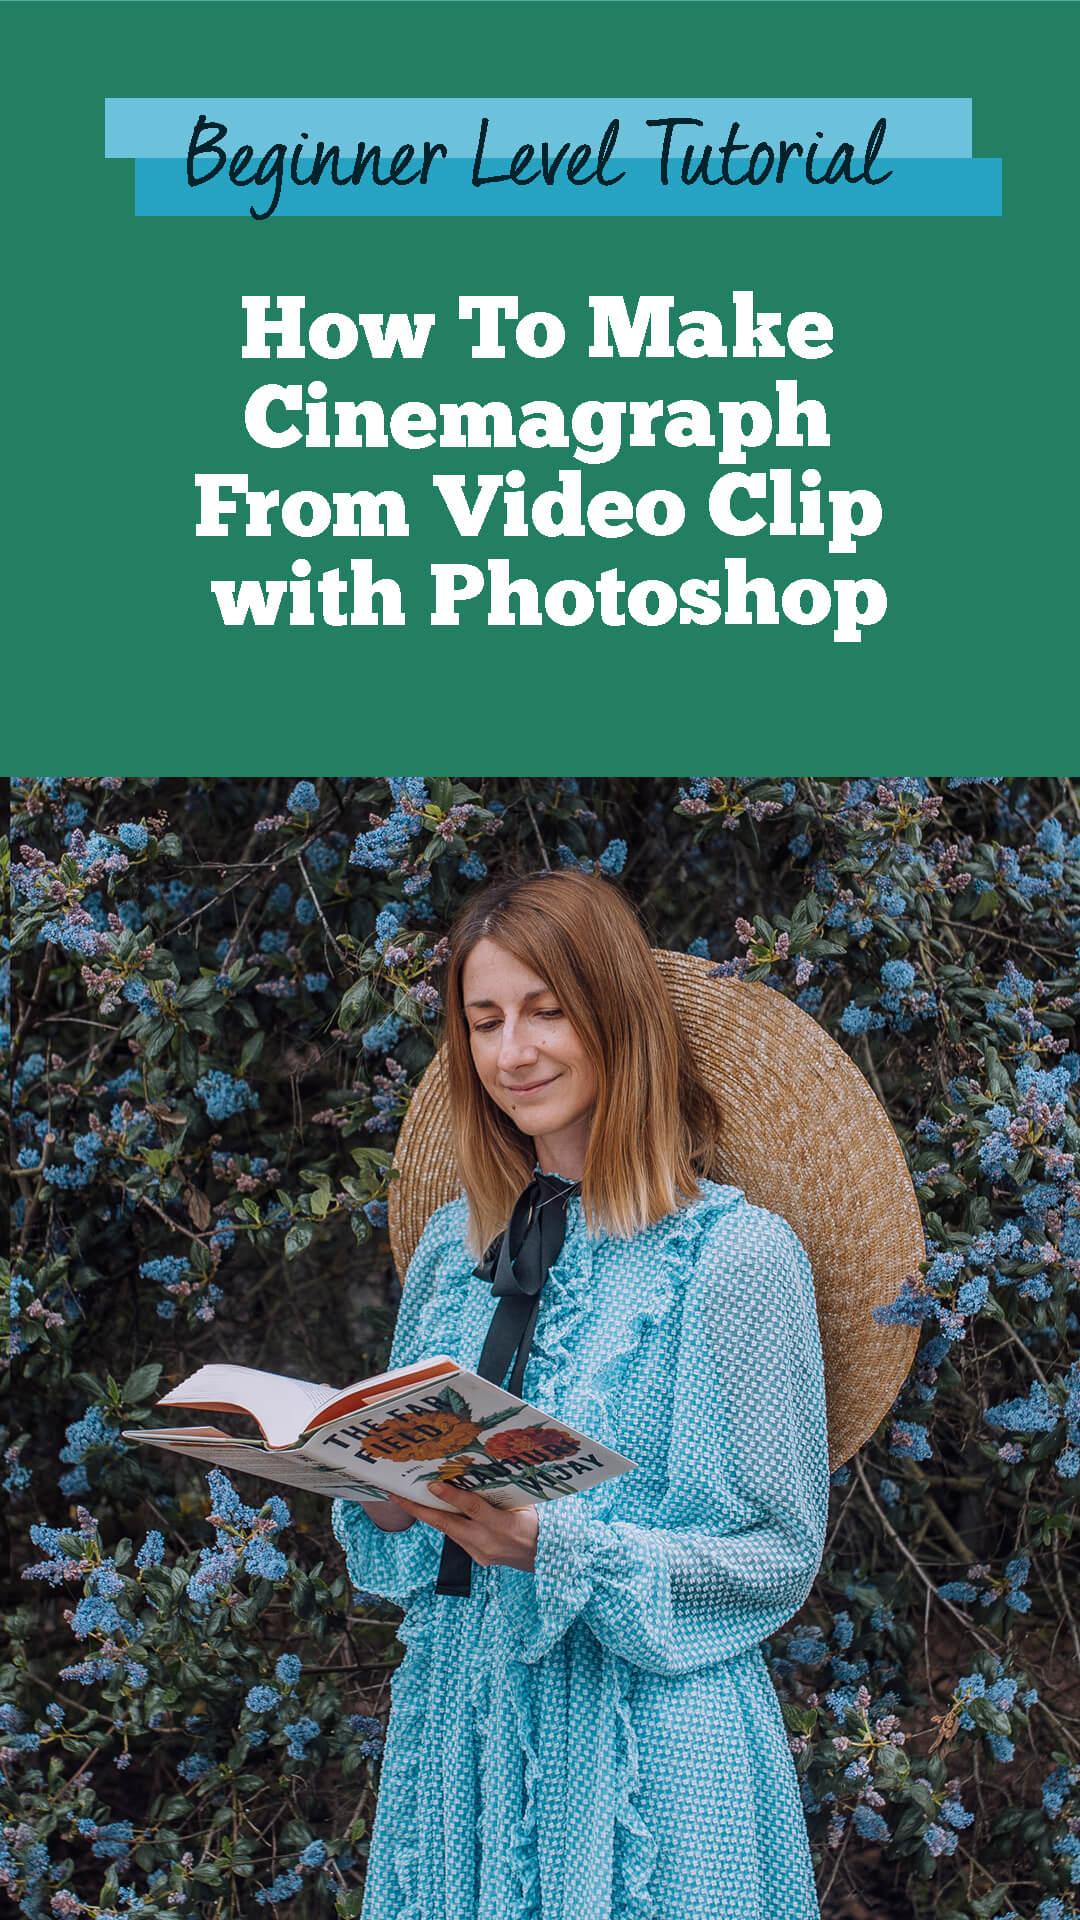 cinemagraph-tutorial-pin2.jpg